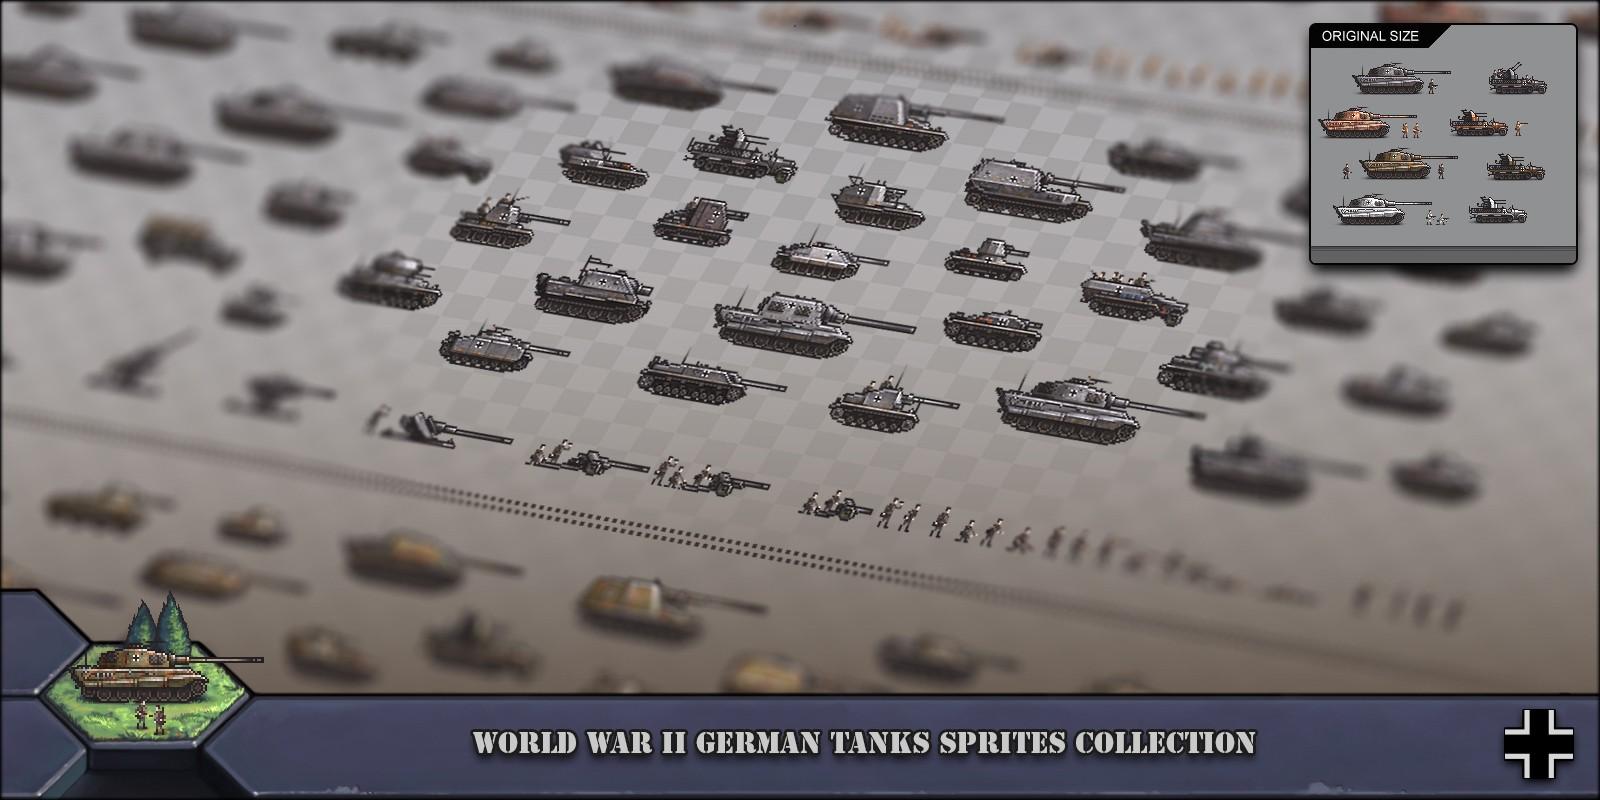 World War 2 German Tanks Sprites Collection